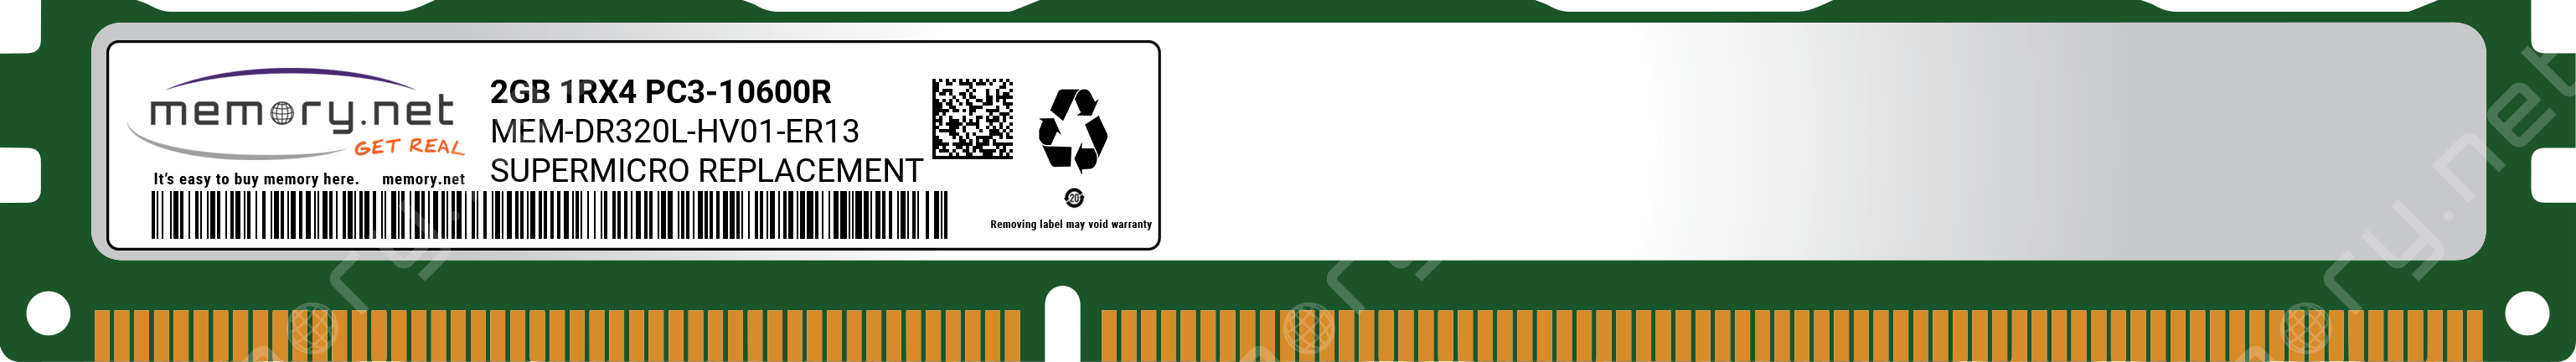 MEM-DR320L-HV01-ER13